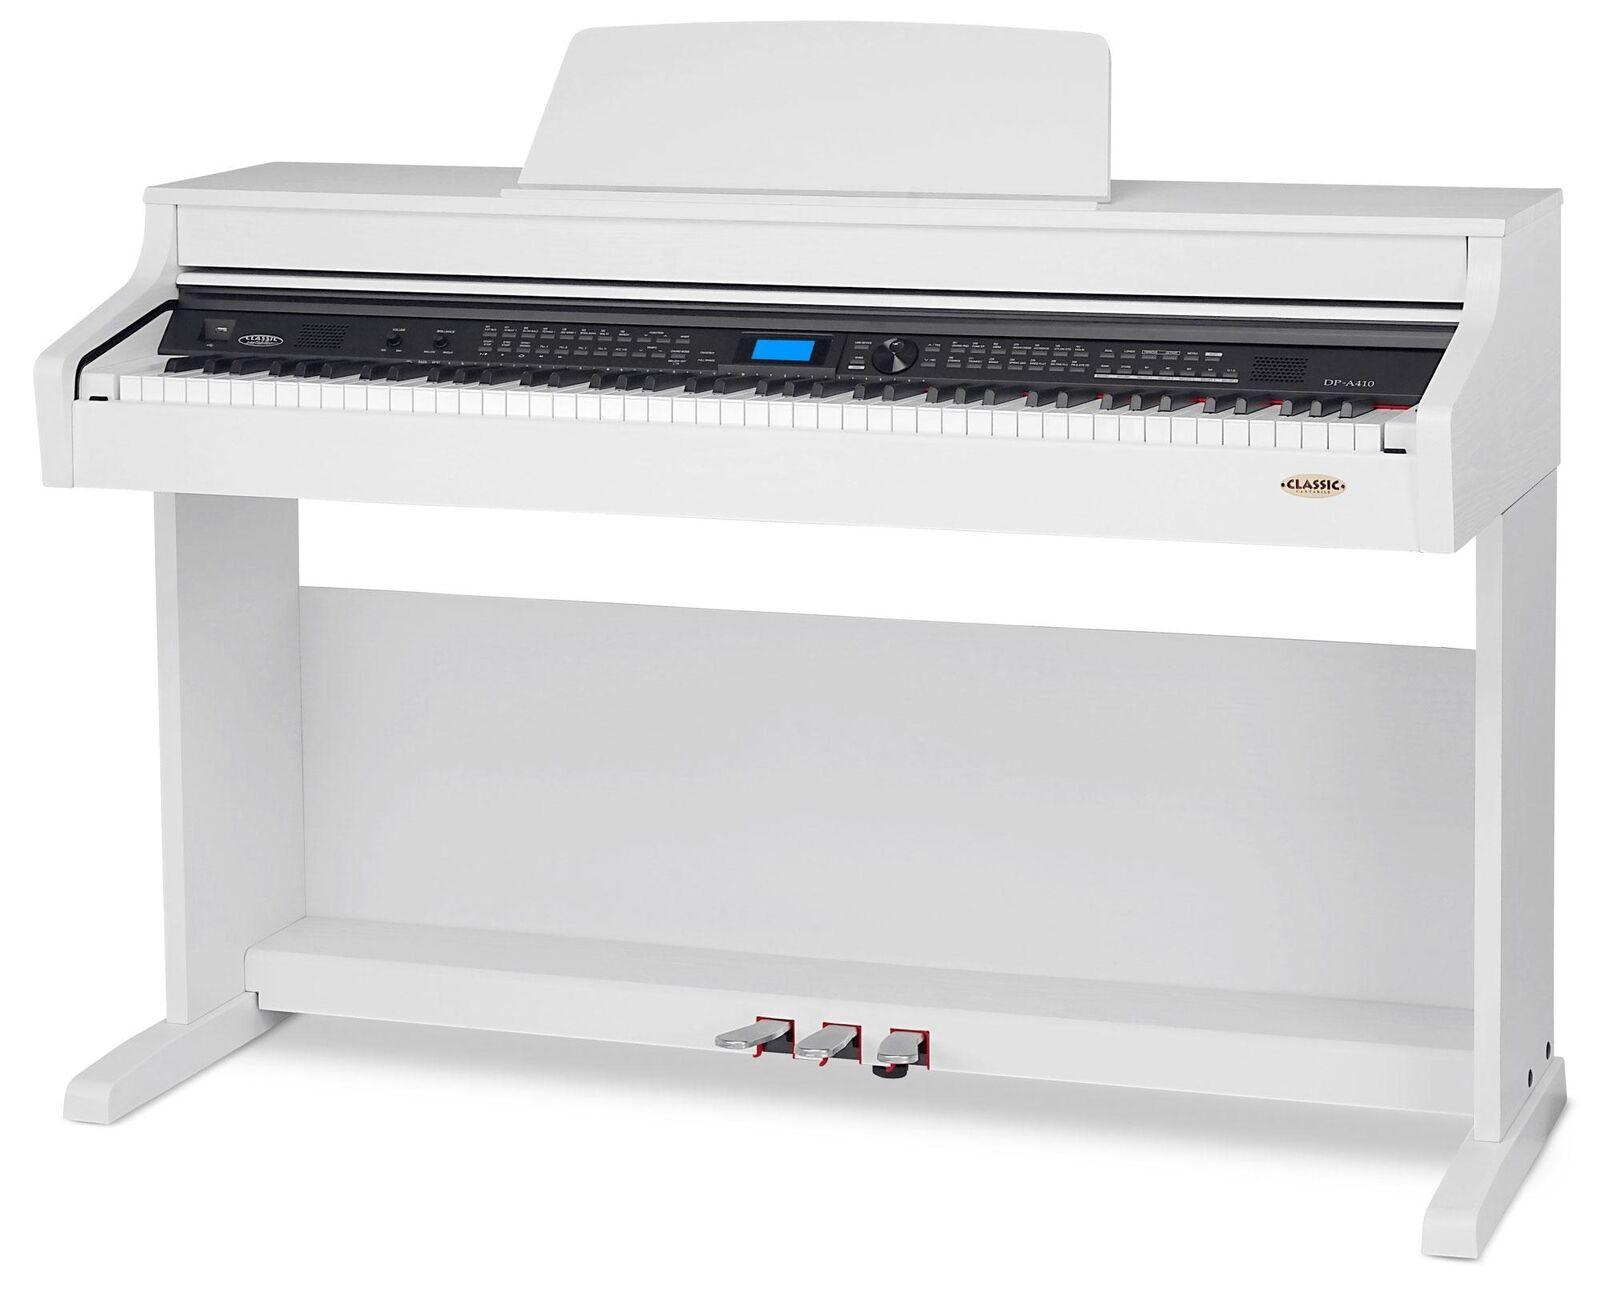 Anfänger Digitalpiano mit EQ & DSP-Effekt, Splitfunktion AUX weiß matt